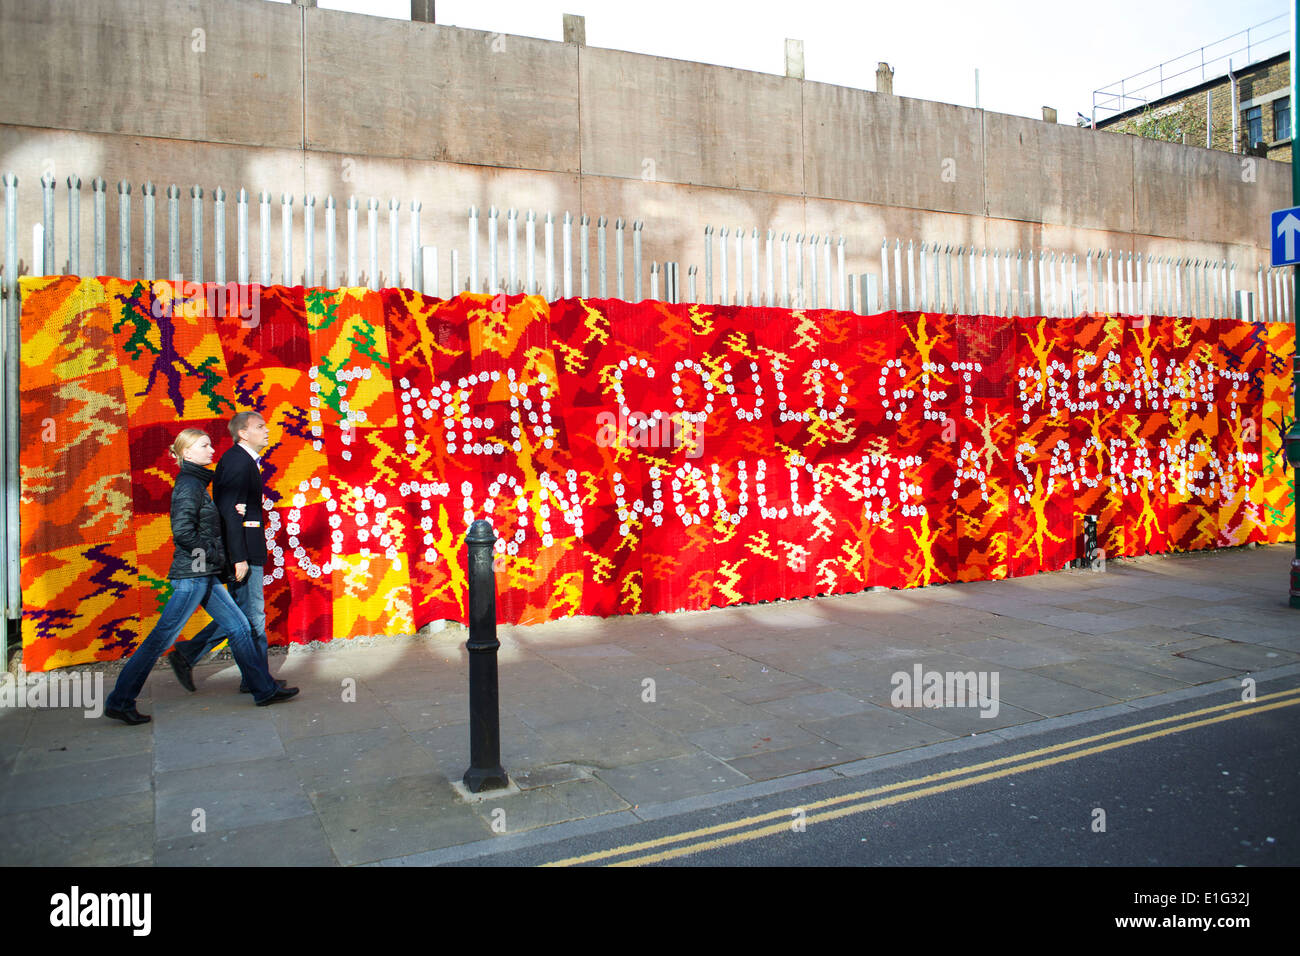 Knitted Street Art Stockfotos & Knitted Street Art Bilder - Alamy